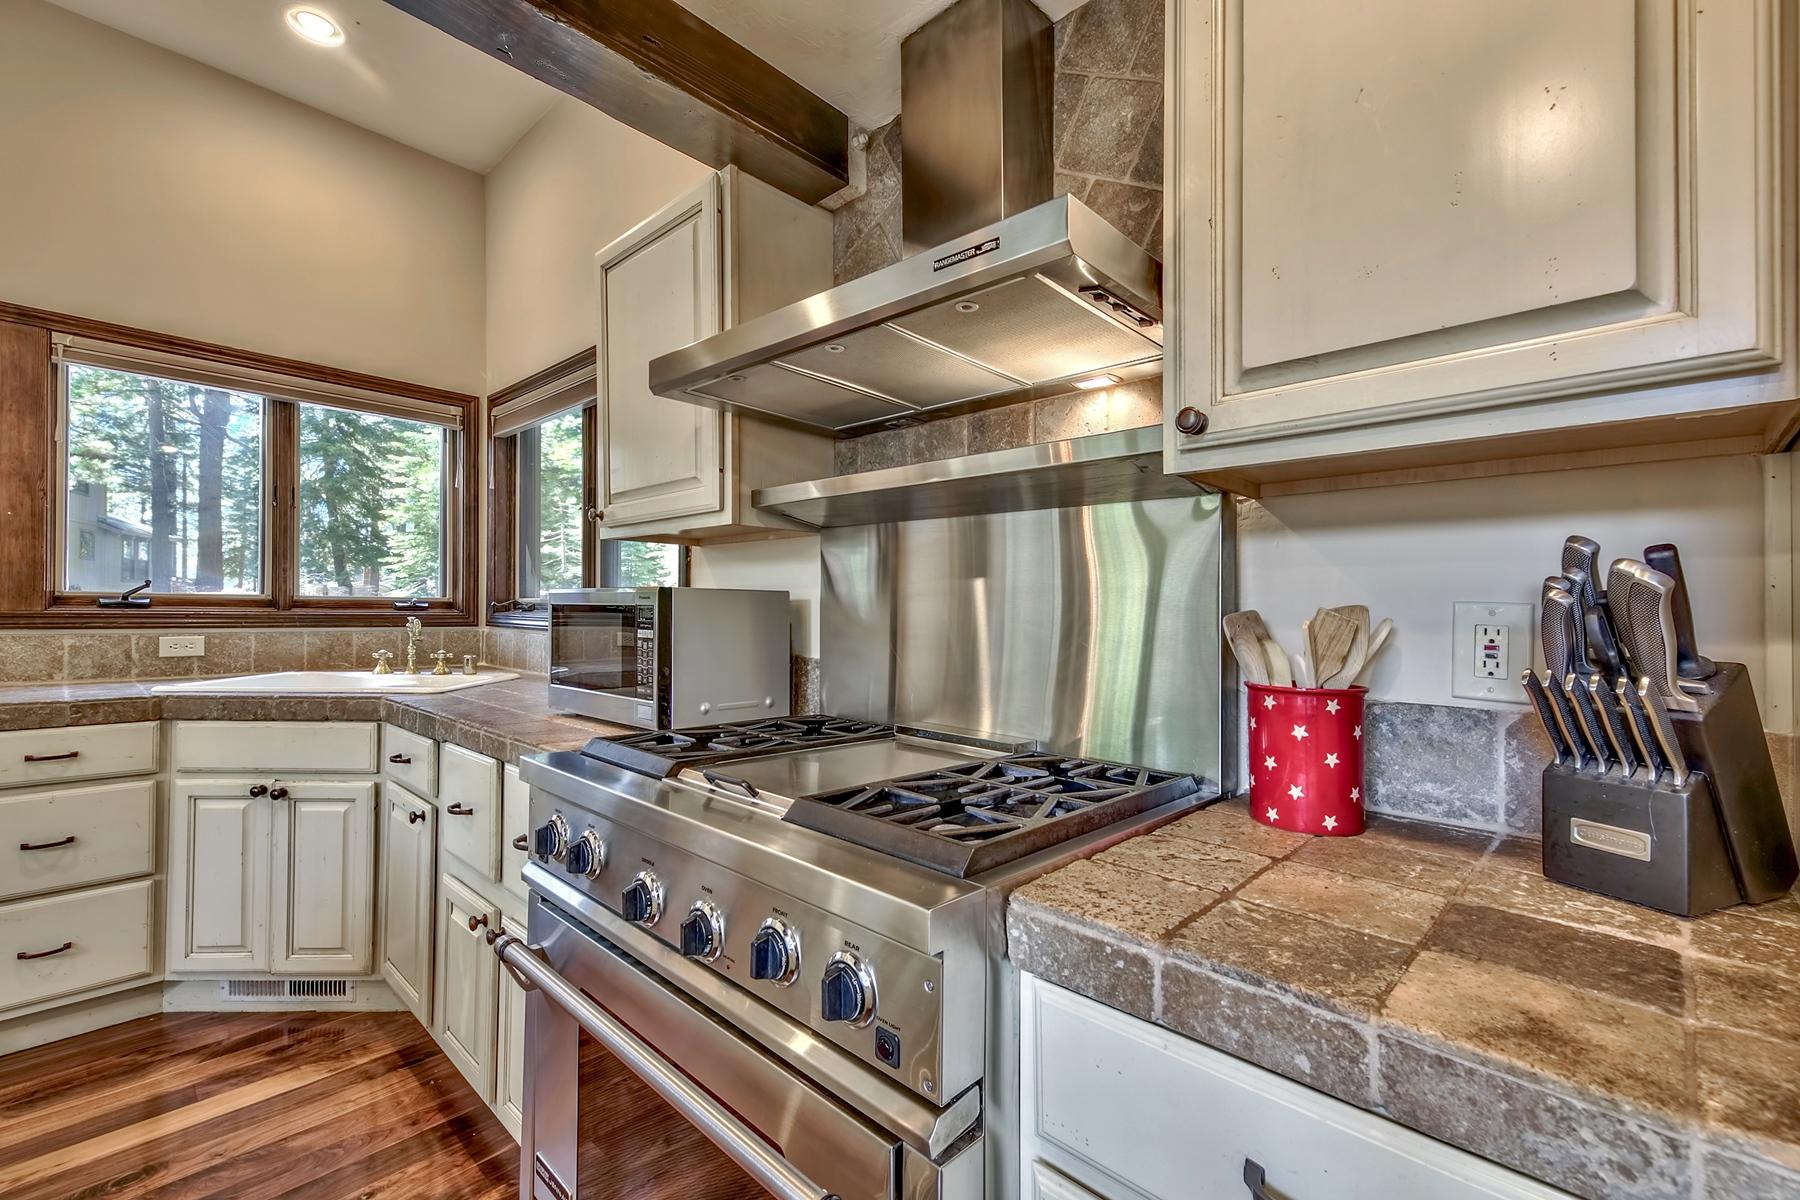 Additional photo for property listing at 825 Jeffrey St, Incline Village, NV 89451 825 Jeffrey Street Incline Village, Nevada 89451 United States